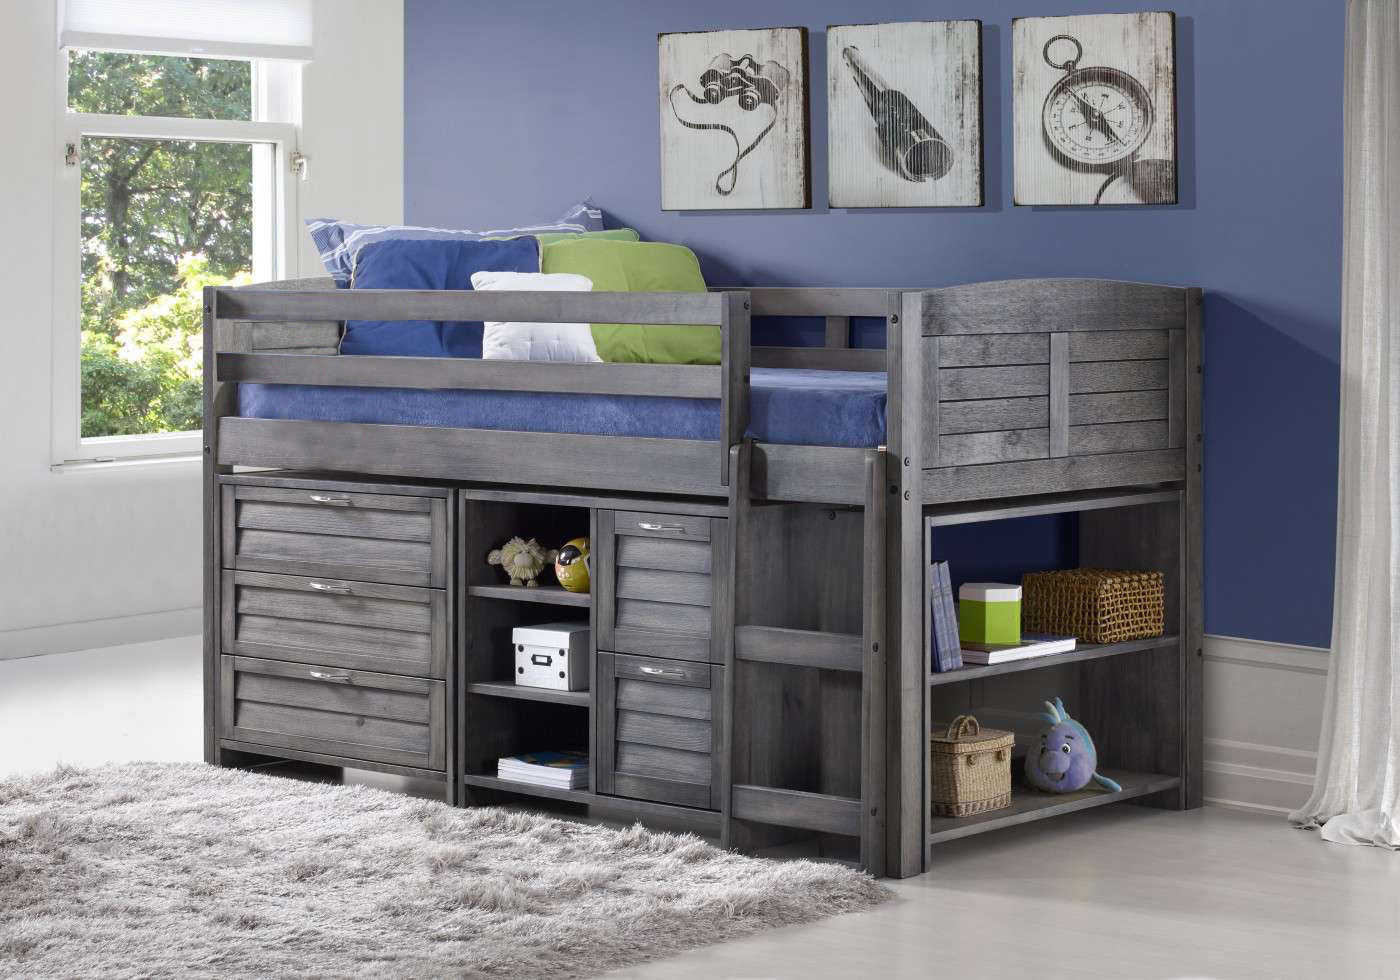 Picture of: Cozy Mid Sleeper Bristol Beds Divan Beds Pine Beds Bunk Beds Metal Beds Mattresses And More